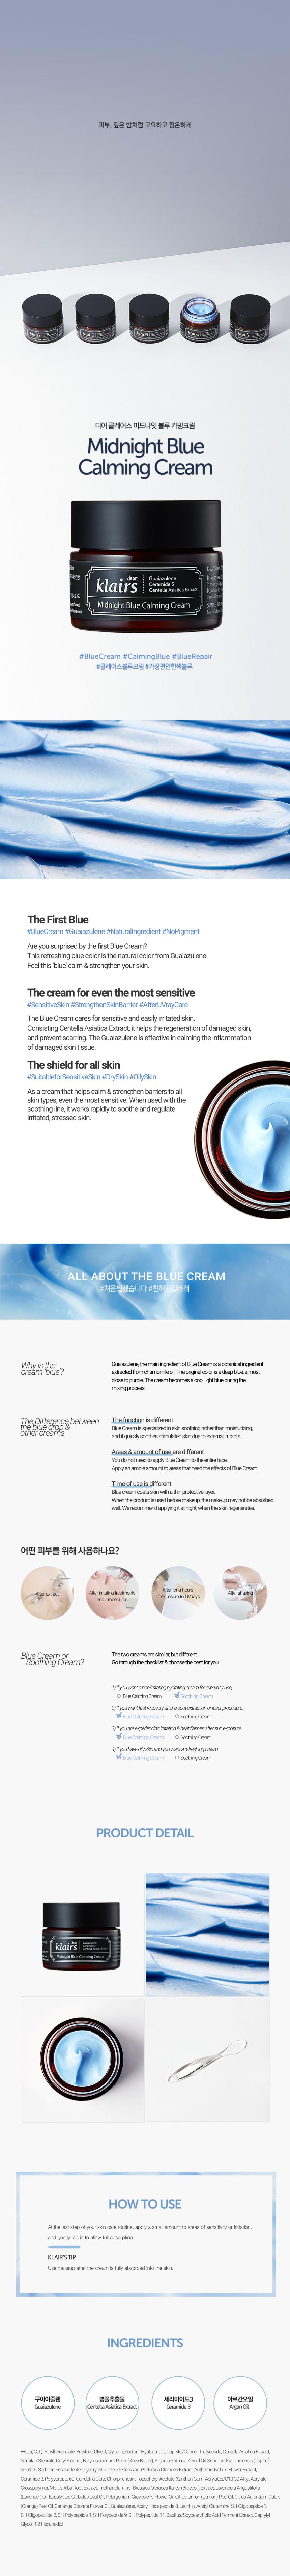 Klairs-Midnight-Blue-Calming-Cream_30ml_ENG.jpg